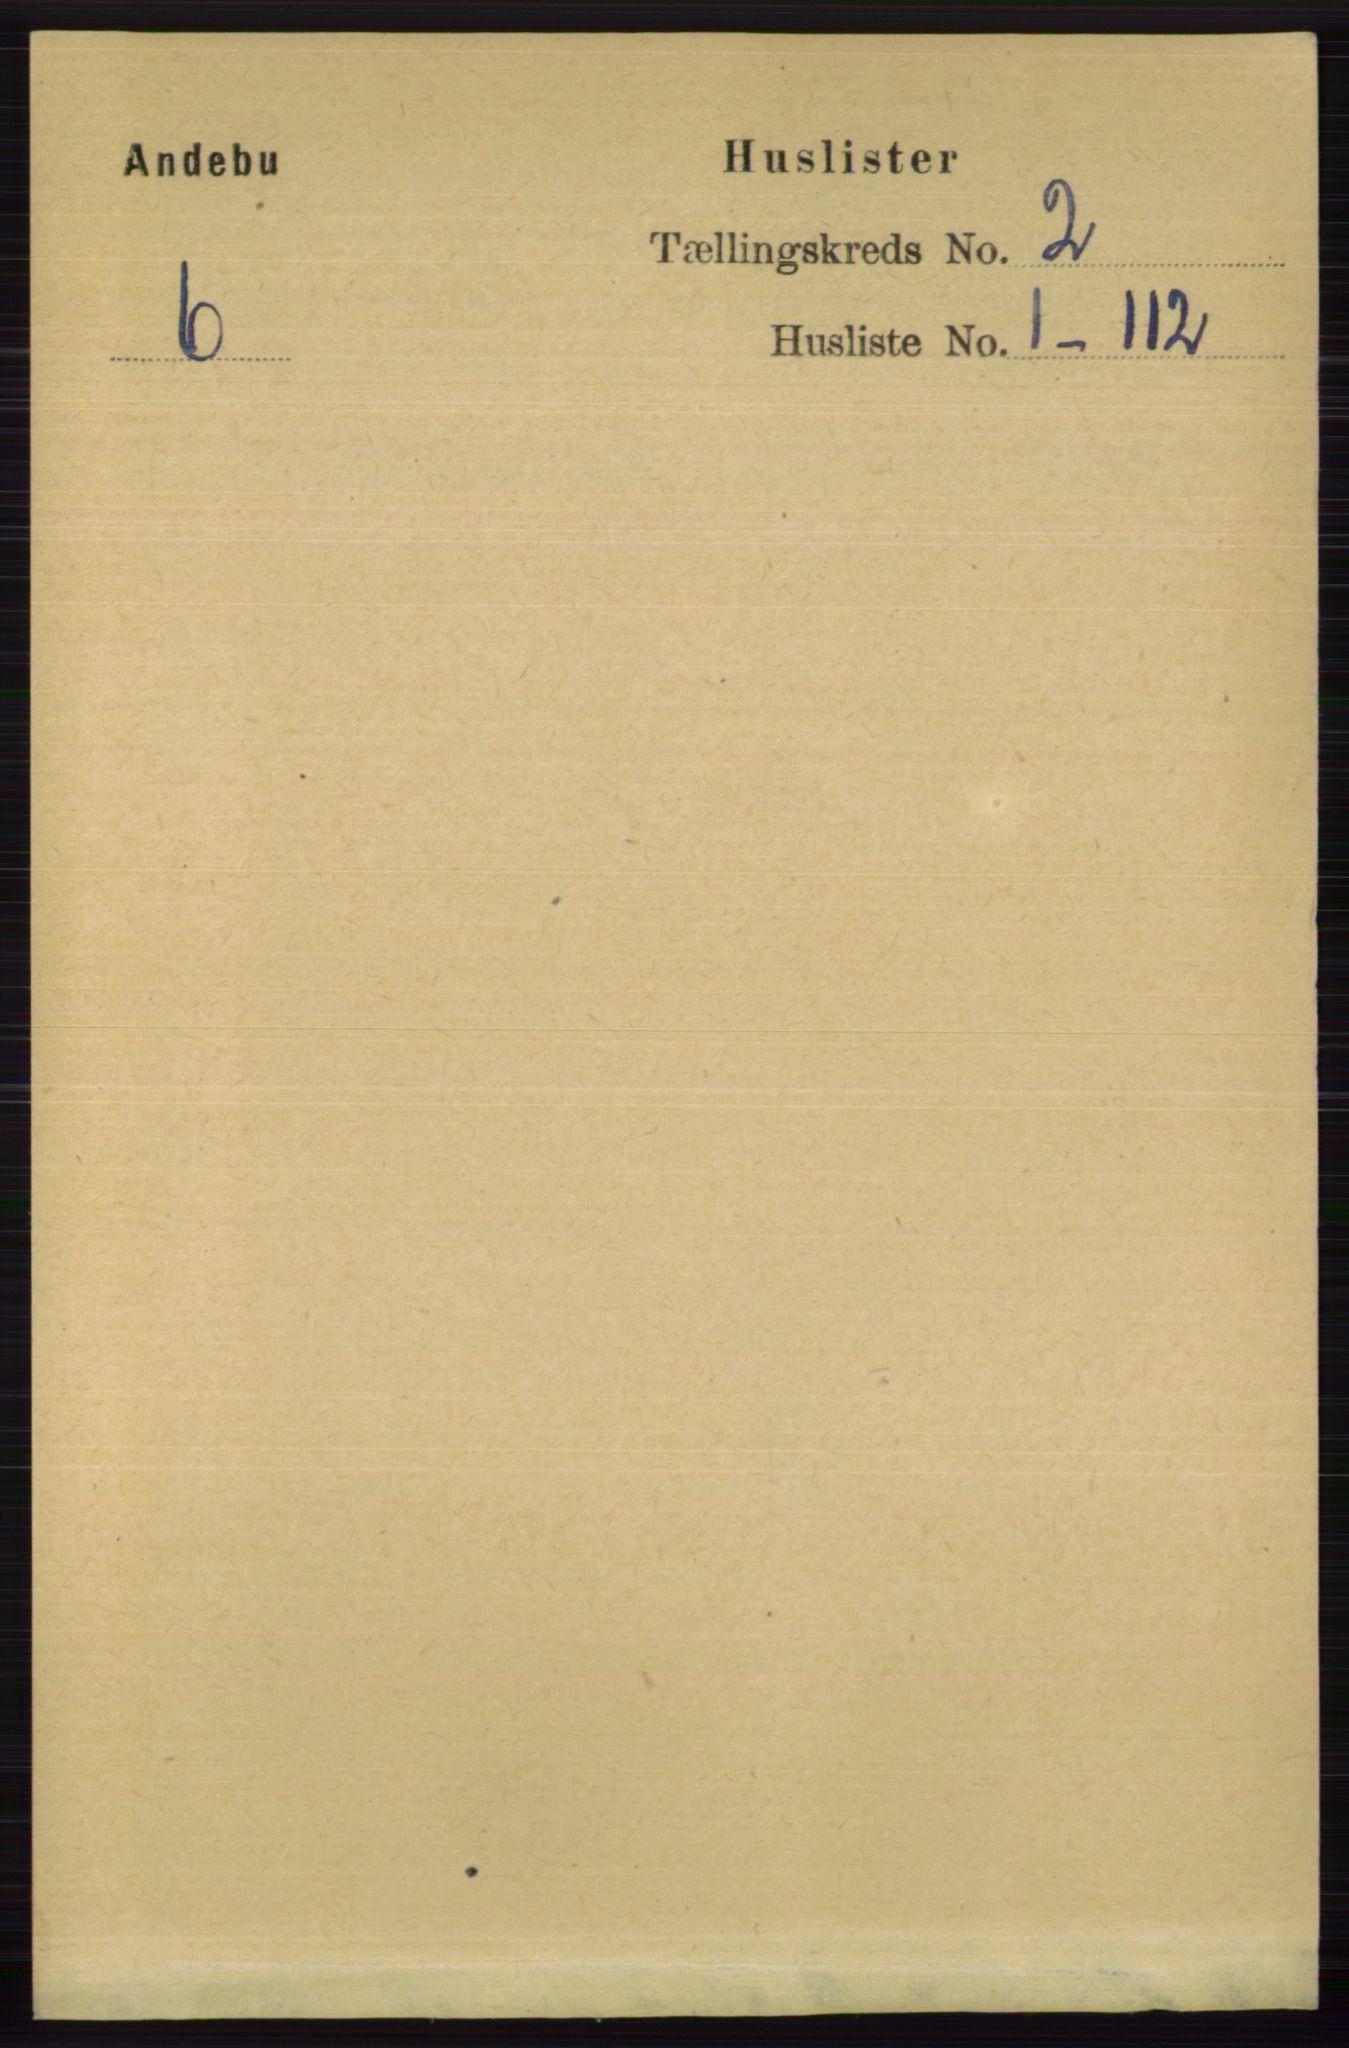 RA, Folketelling 1891 for 0719 Andebu herred, 1891, s. 779